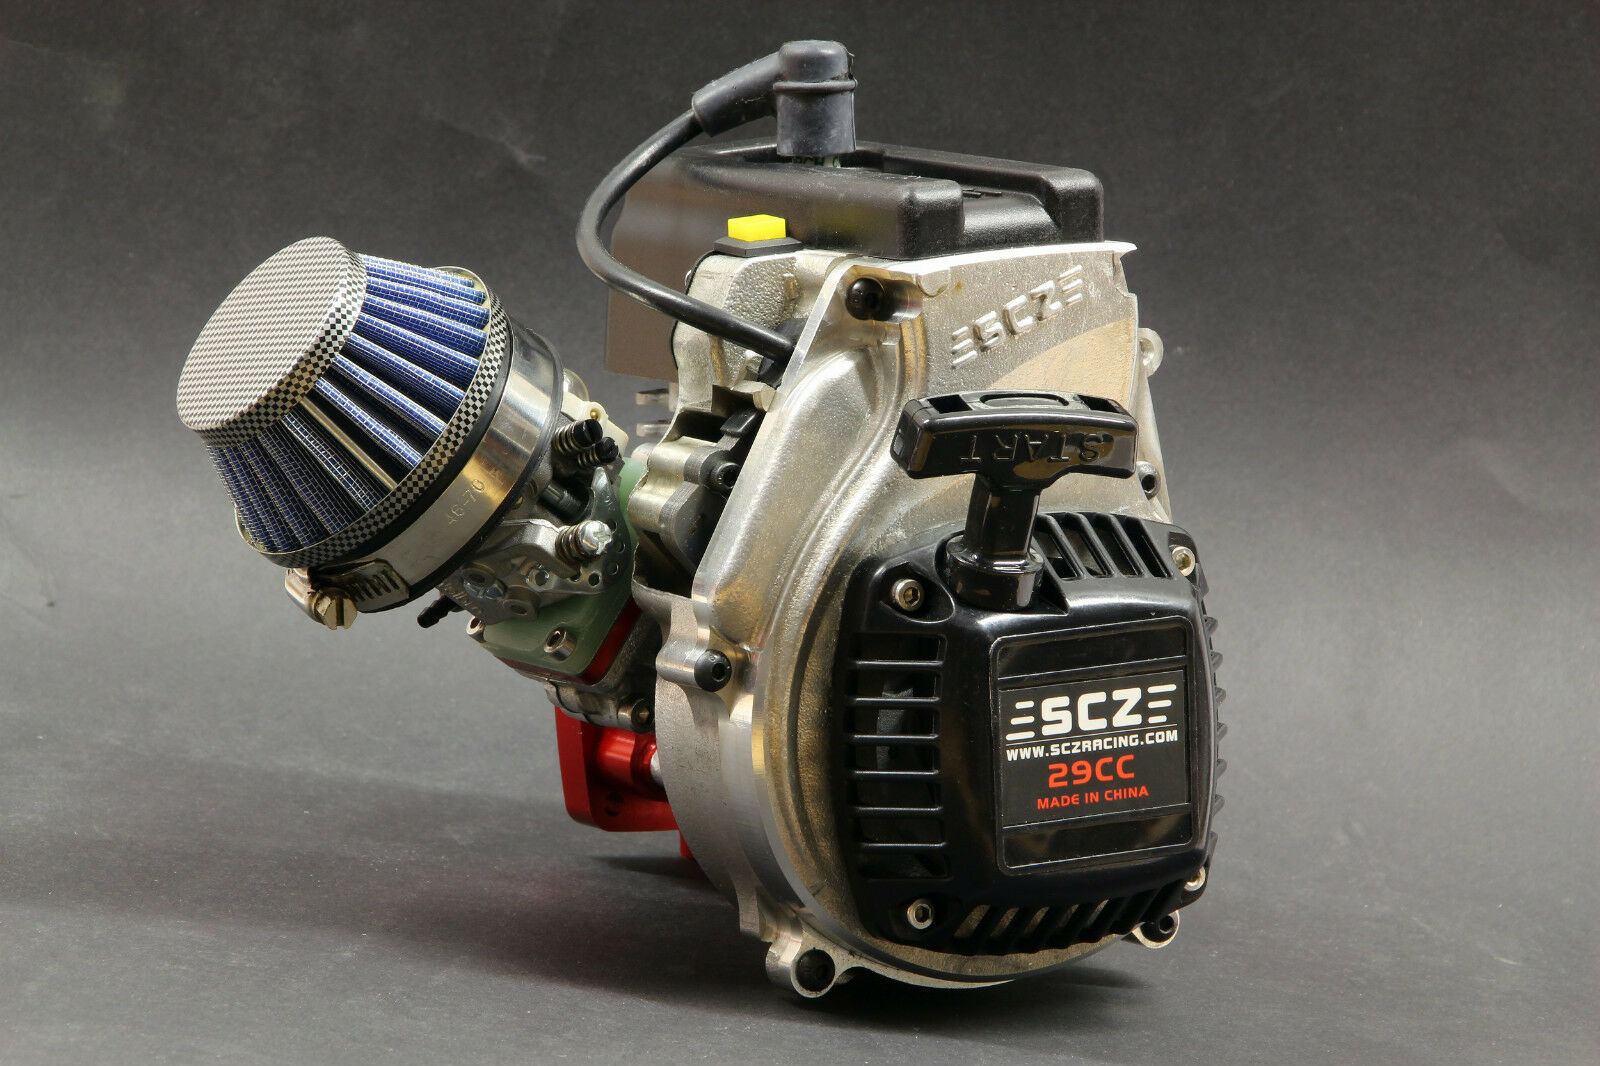 29ccm scz tuningmotor motor 9ps membrana control walbro wt1107 hpi Losi FG nuevo